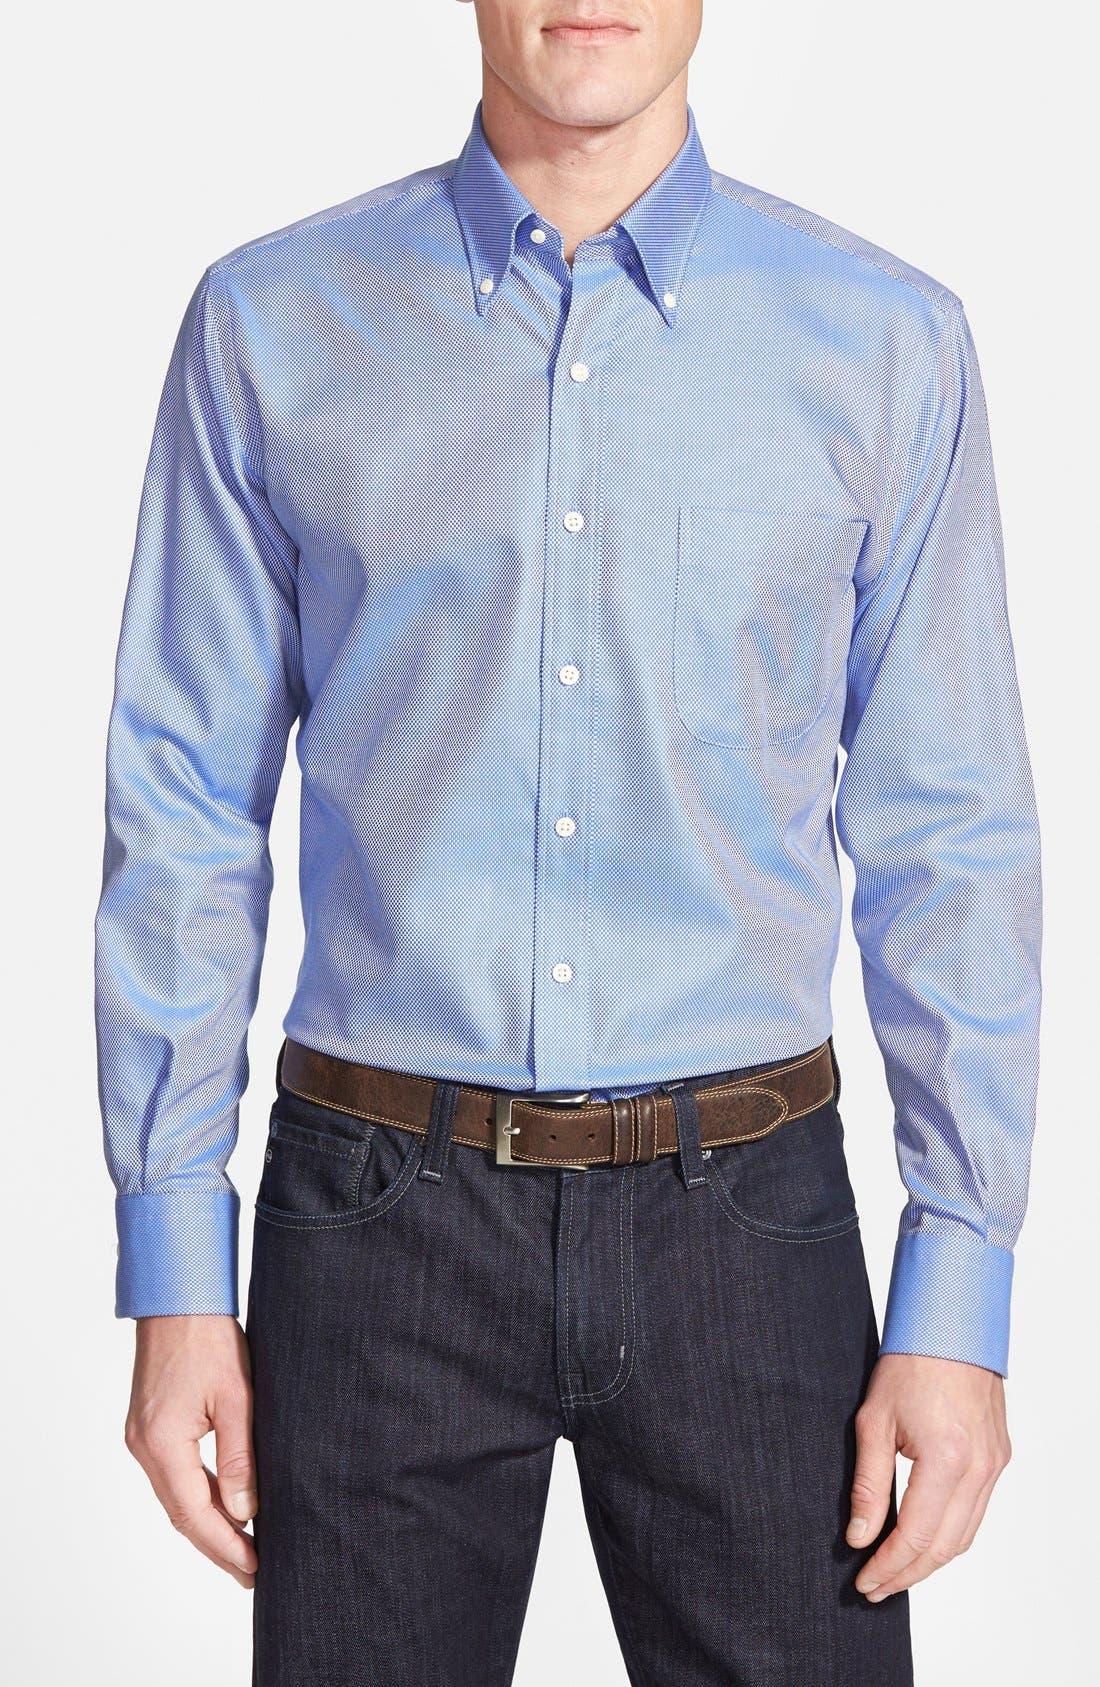 Alternate Image 1 Selected - Peter Millar 'Nanoluxe' Regular Fit Wrinkle Free Sport Shirt